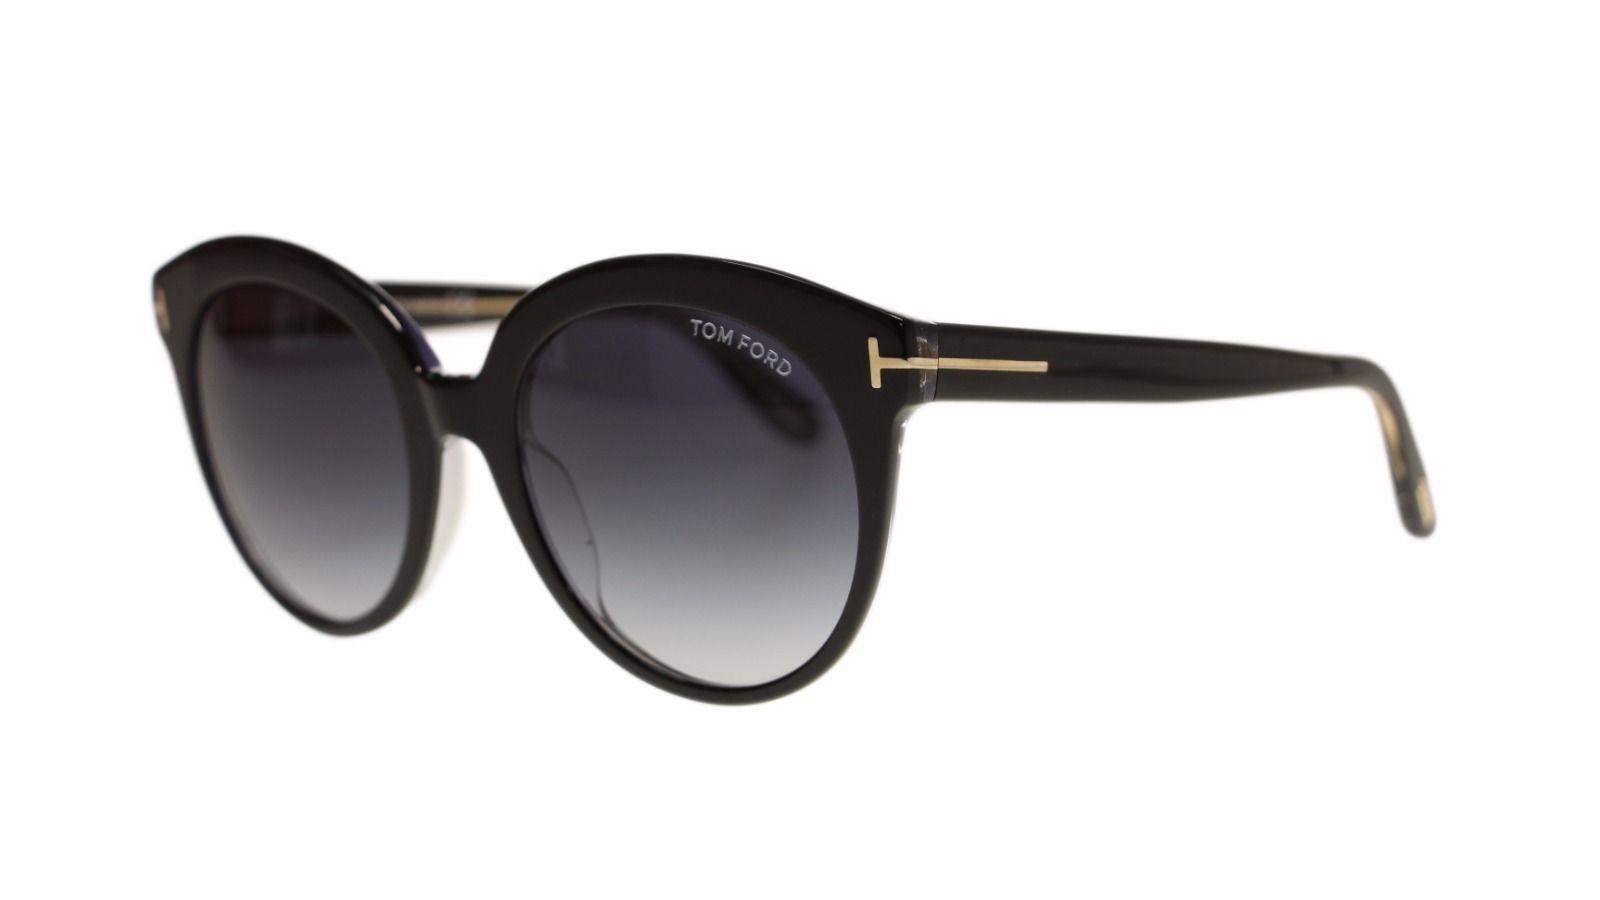 45e5e9d2bbaa2 S l1600. S l1600. Previous. Tom Ford Monica Women s Sunglasses FT0429 03W  Black Blue Gradient ...